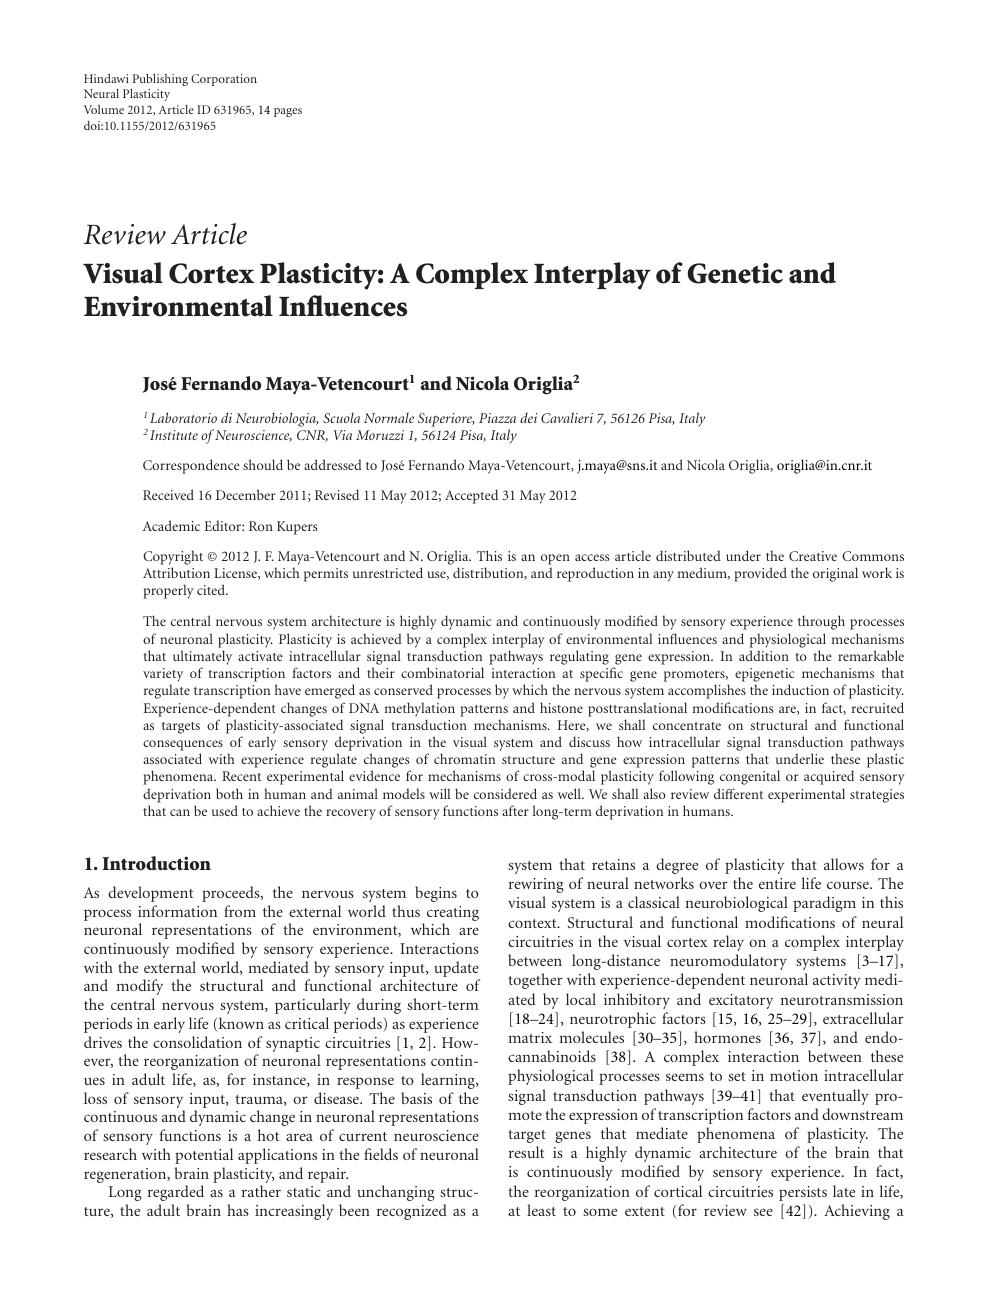 neuroplasticity essay